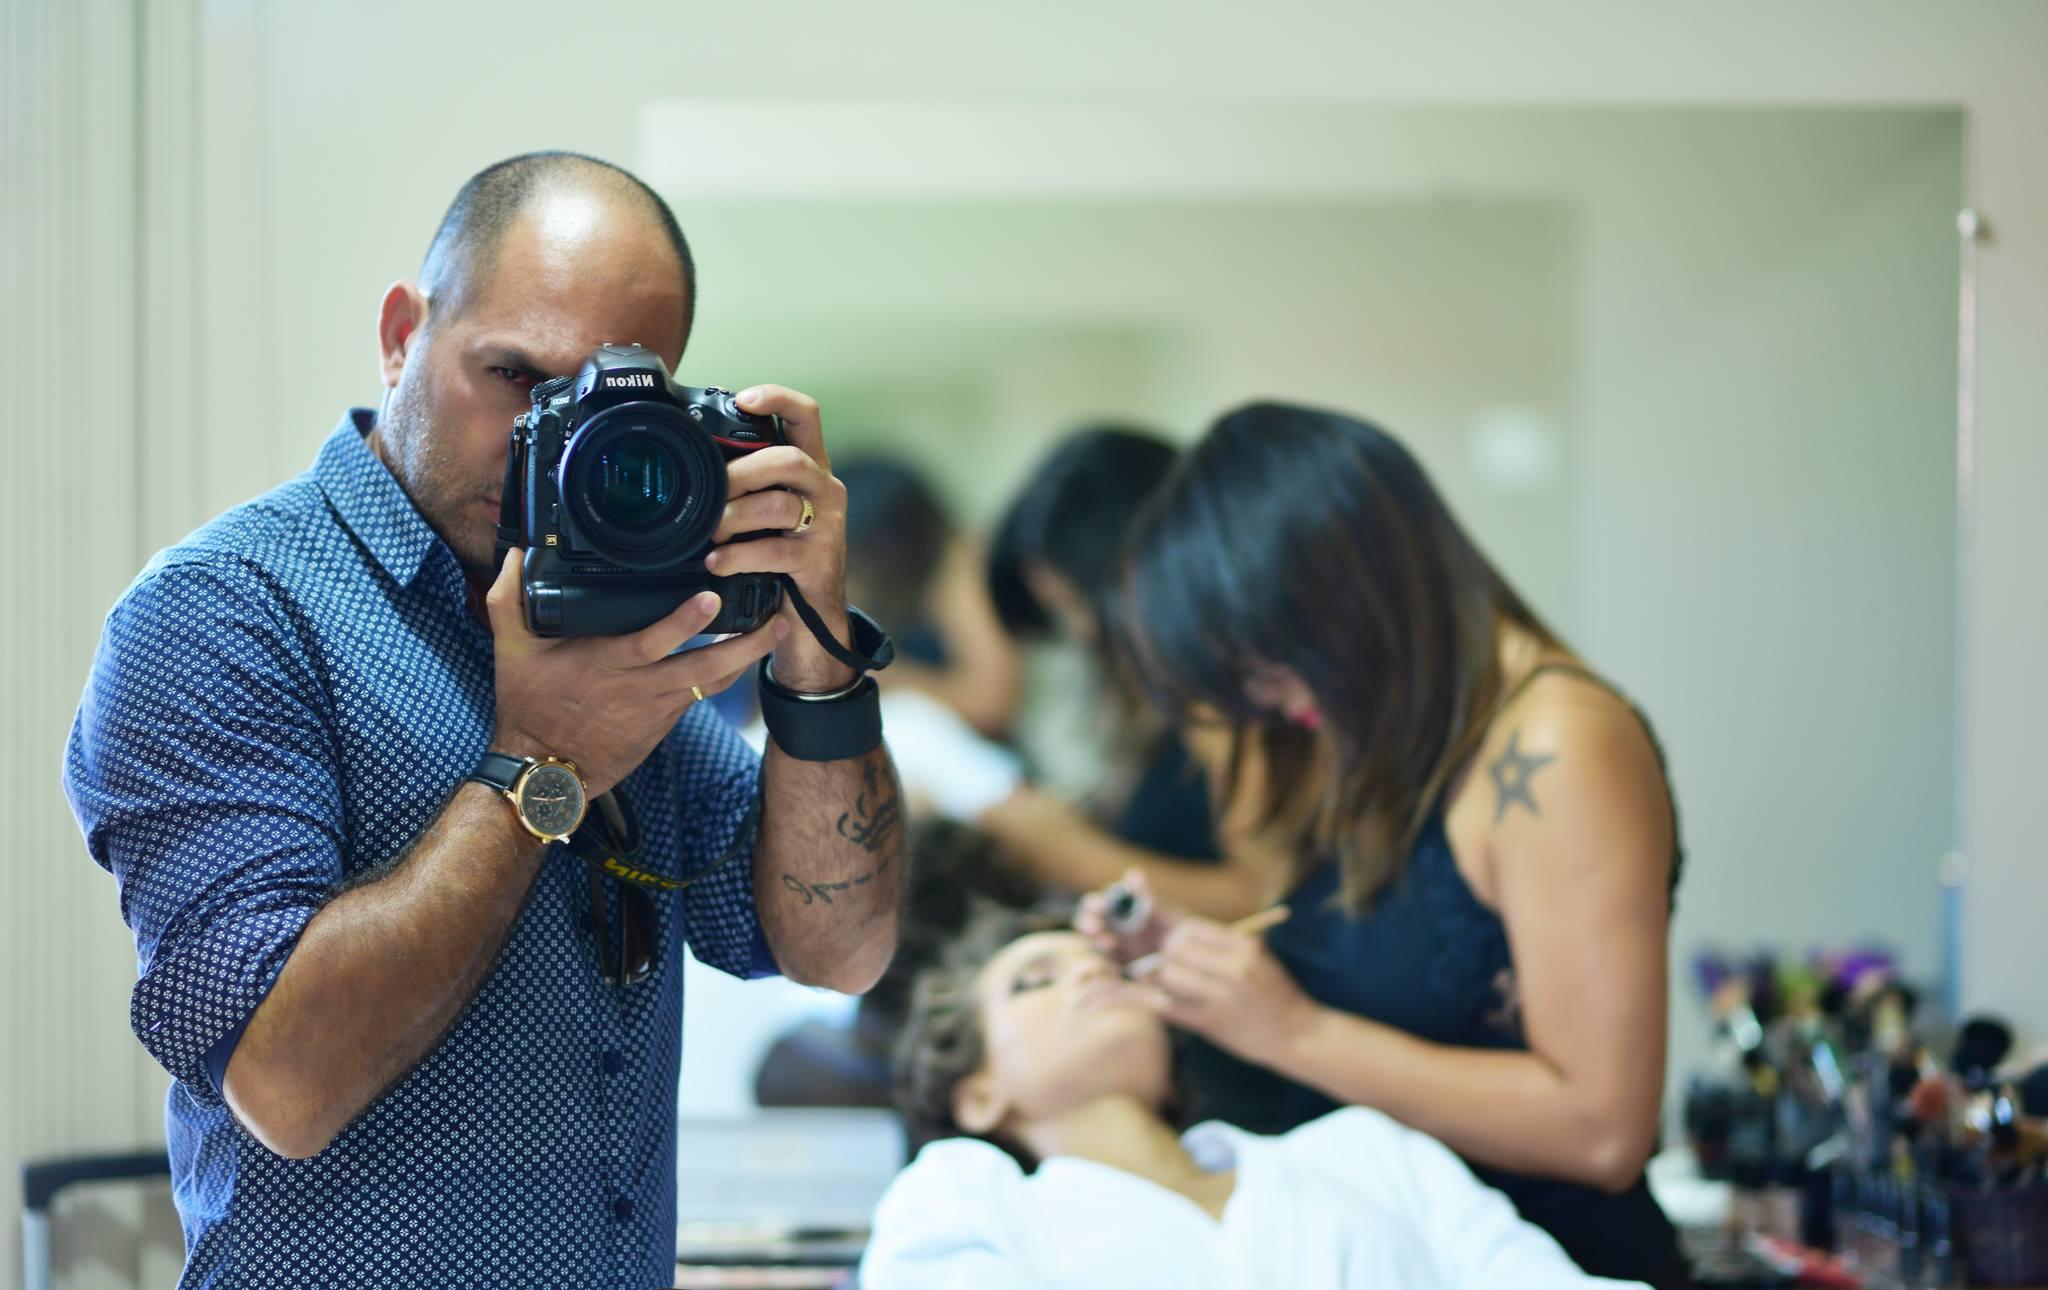 Sobre Fotógrafo de casamento e Moda - Aliram Campos Fashion Wedding